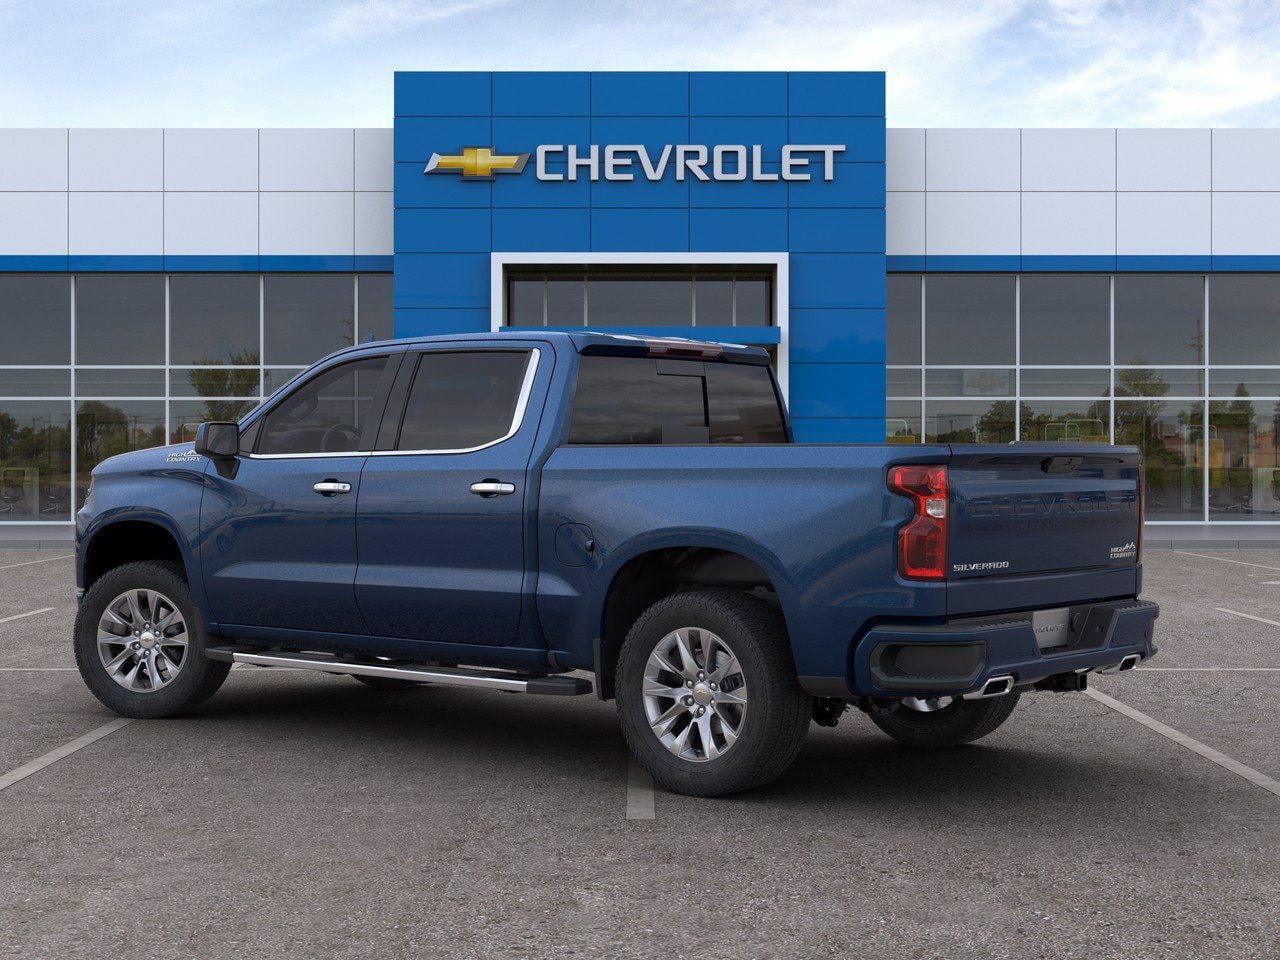 2020 Chevrolet Silverado 1500 Crew Cab 4x4, Pickup #C201648 - photo 4